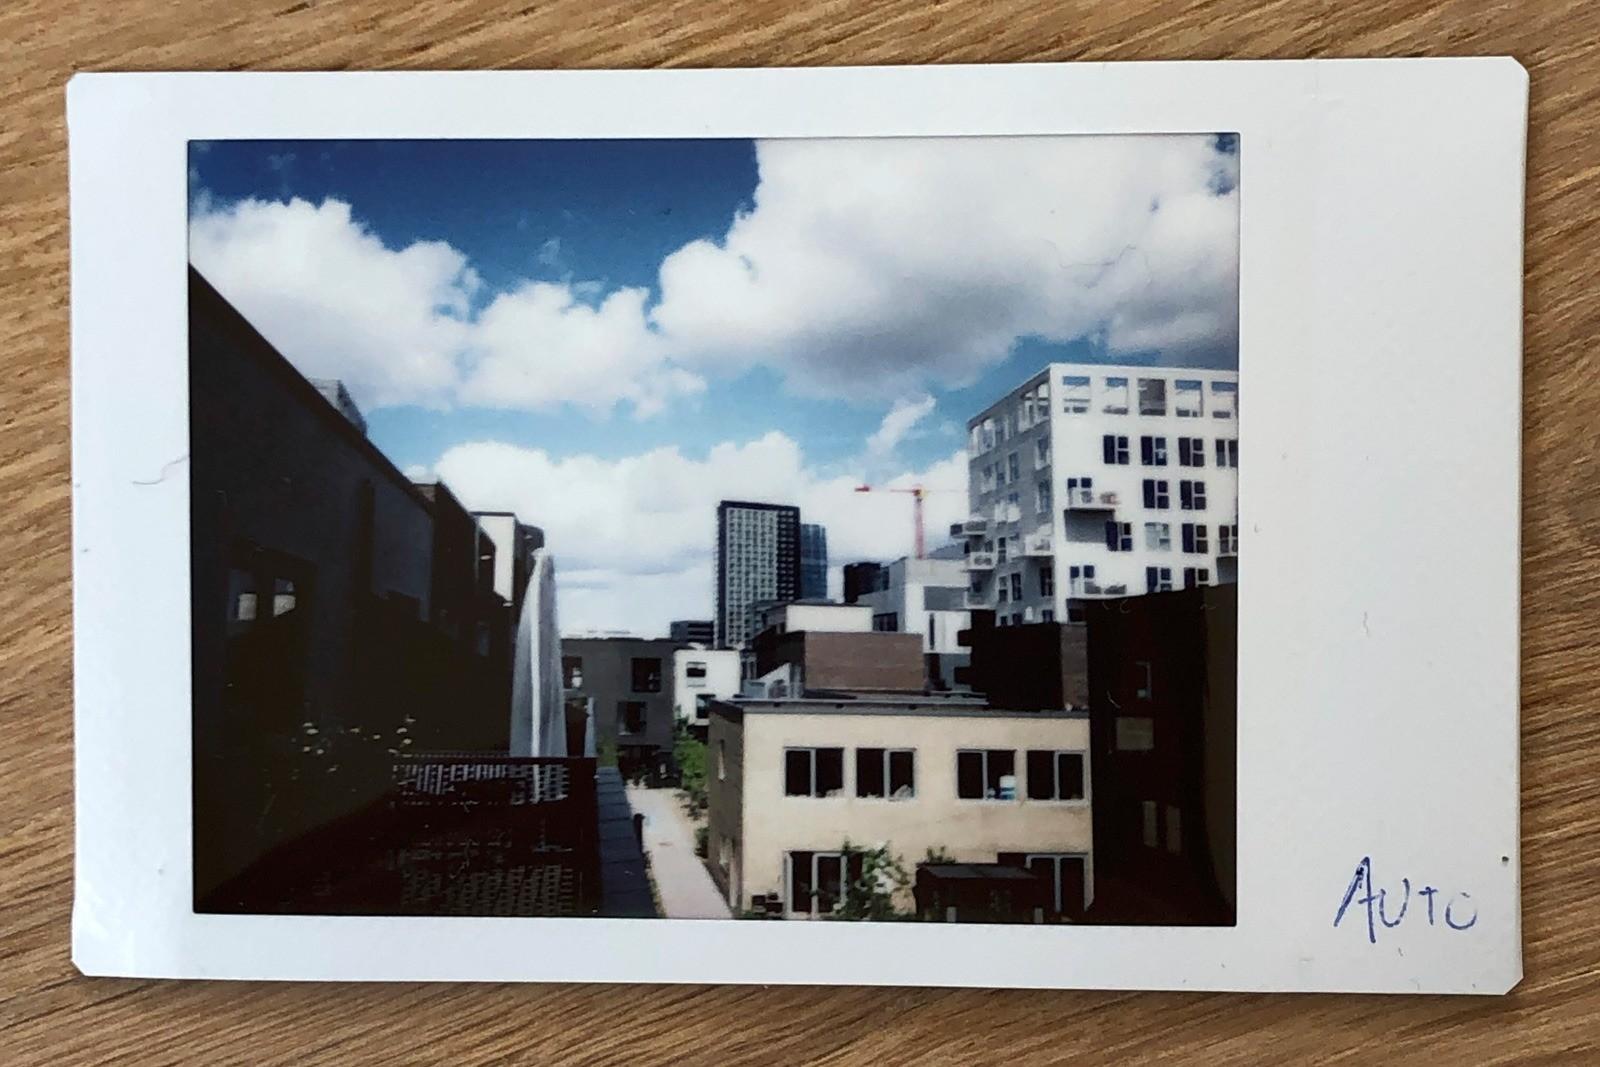 Fujifilm Instax Neo Classic Mini 90 - fotokvalitet test 1